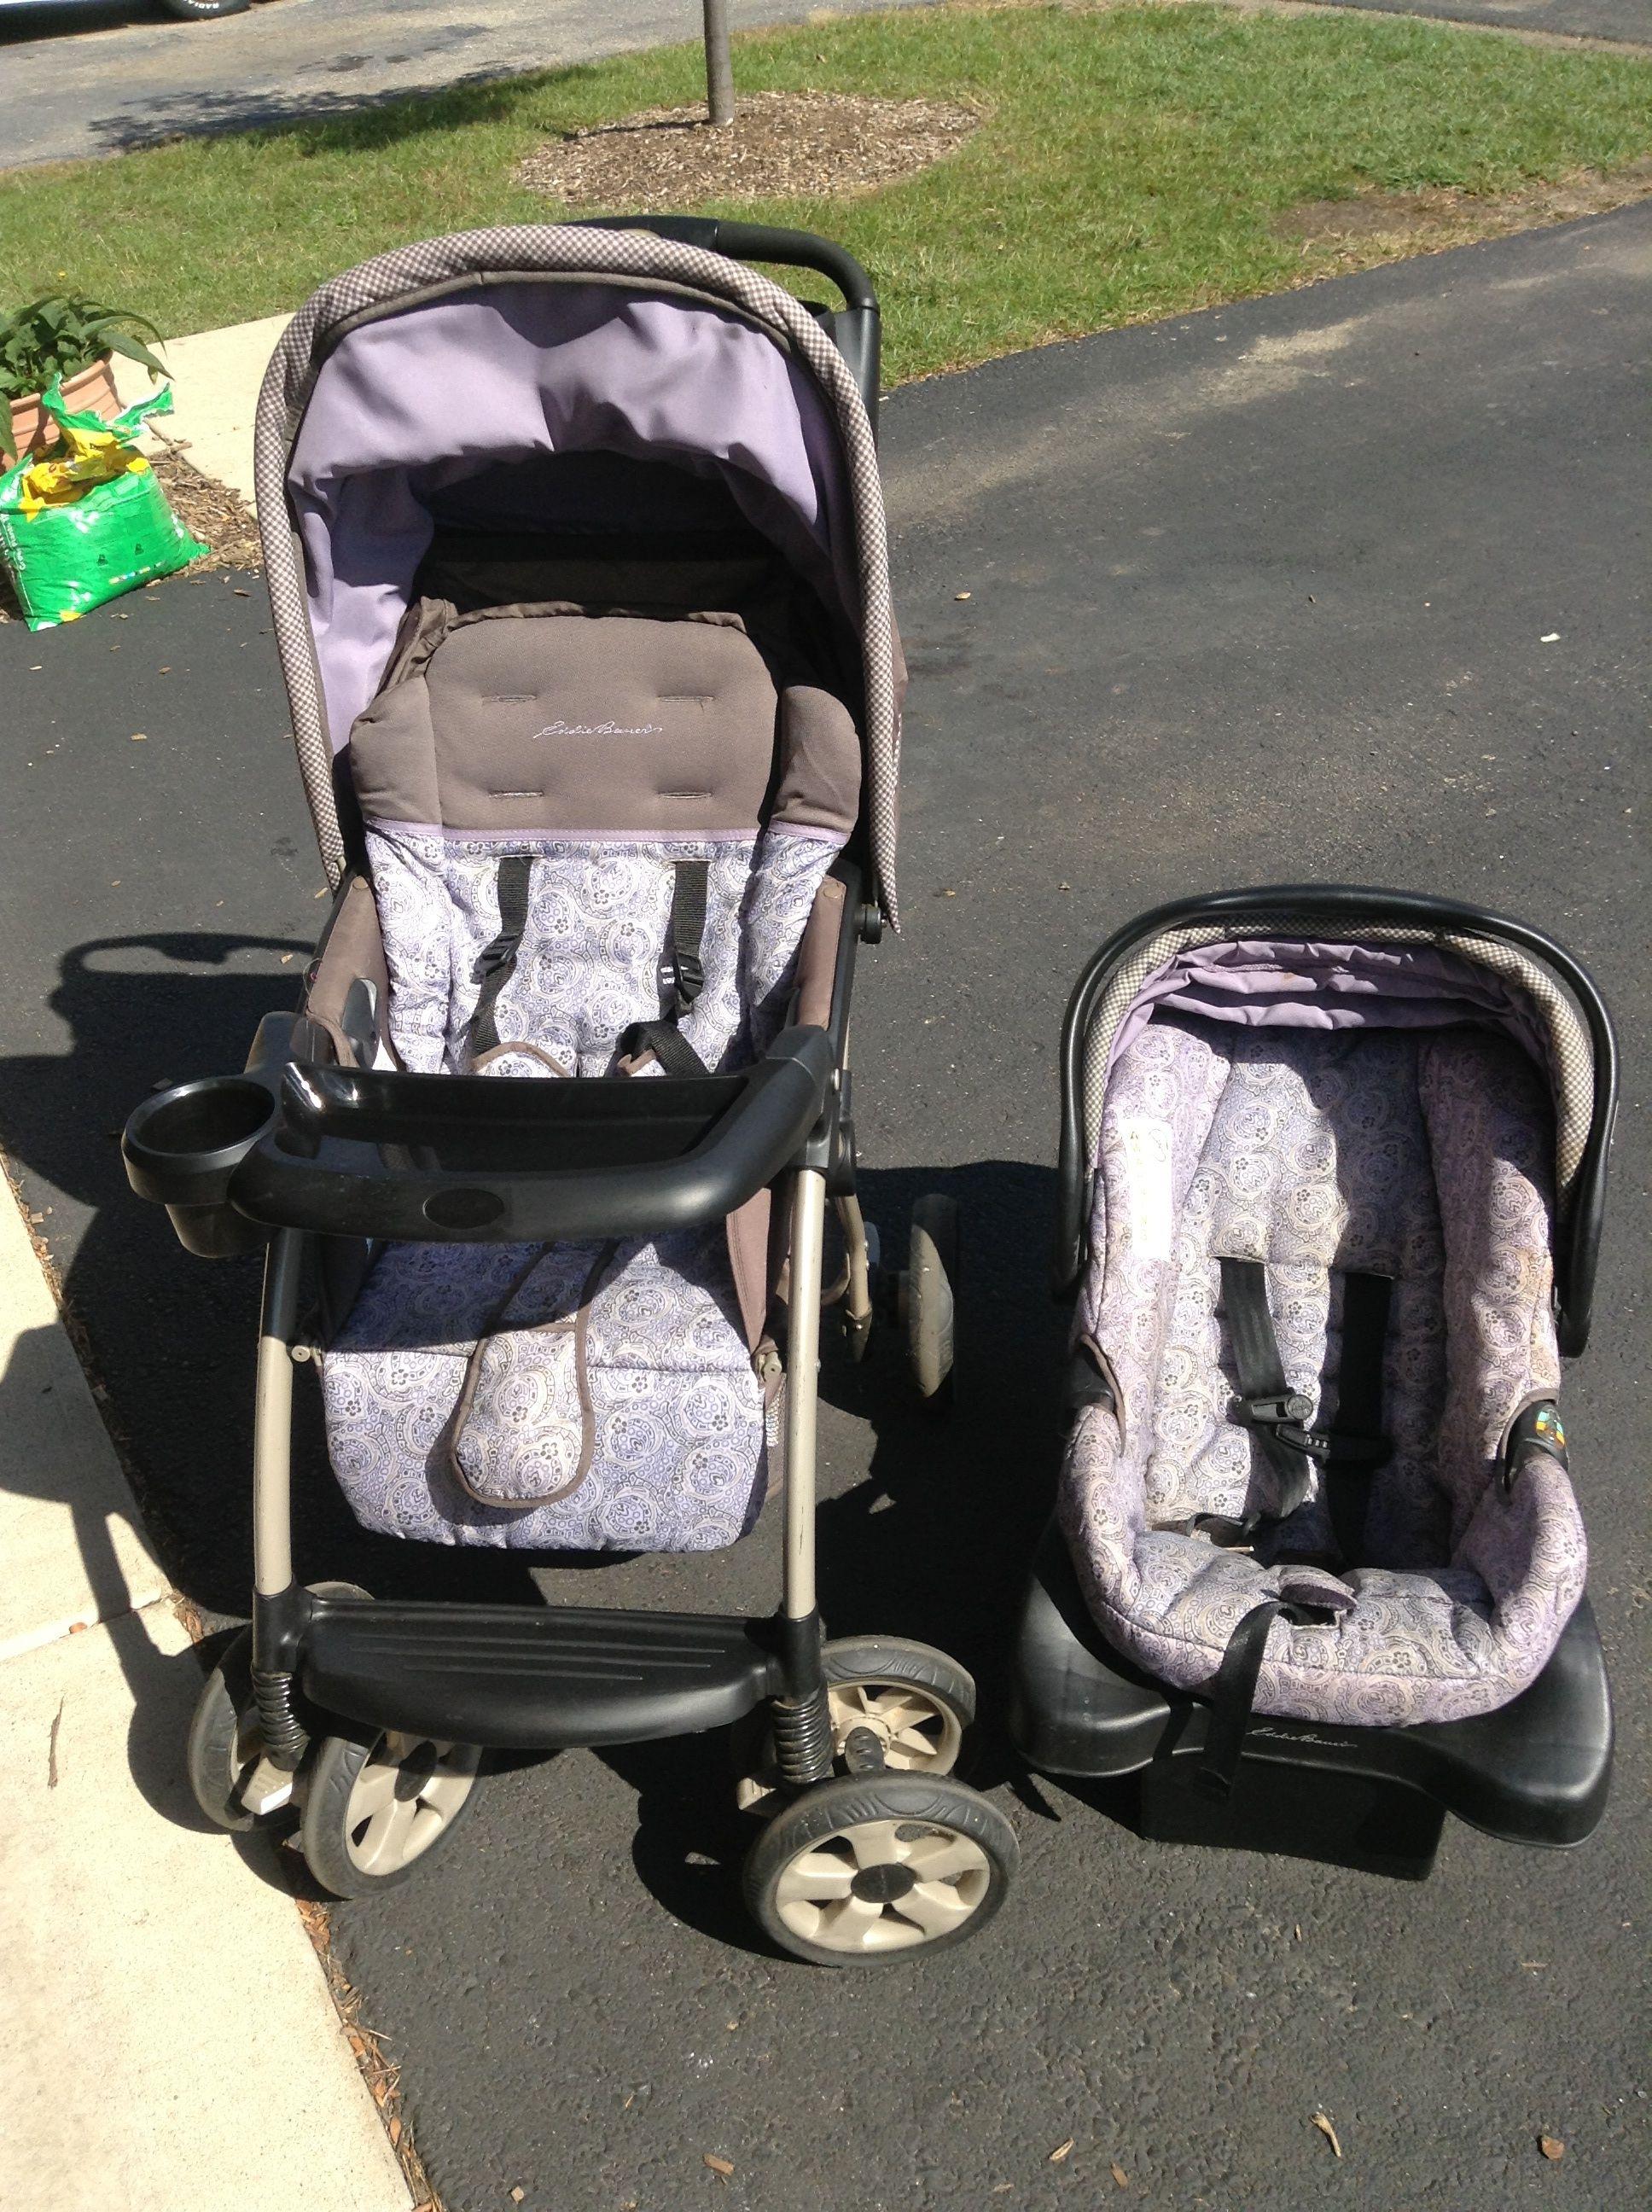 Eddie Bauer stroller/infant car seat in WhatleyWorld's